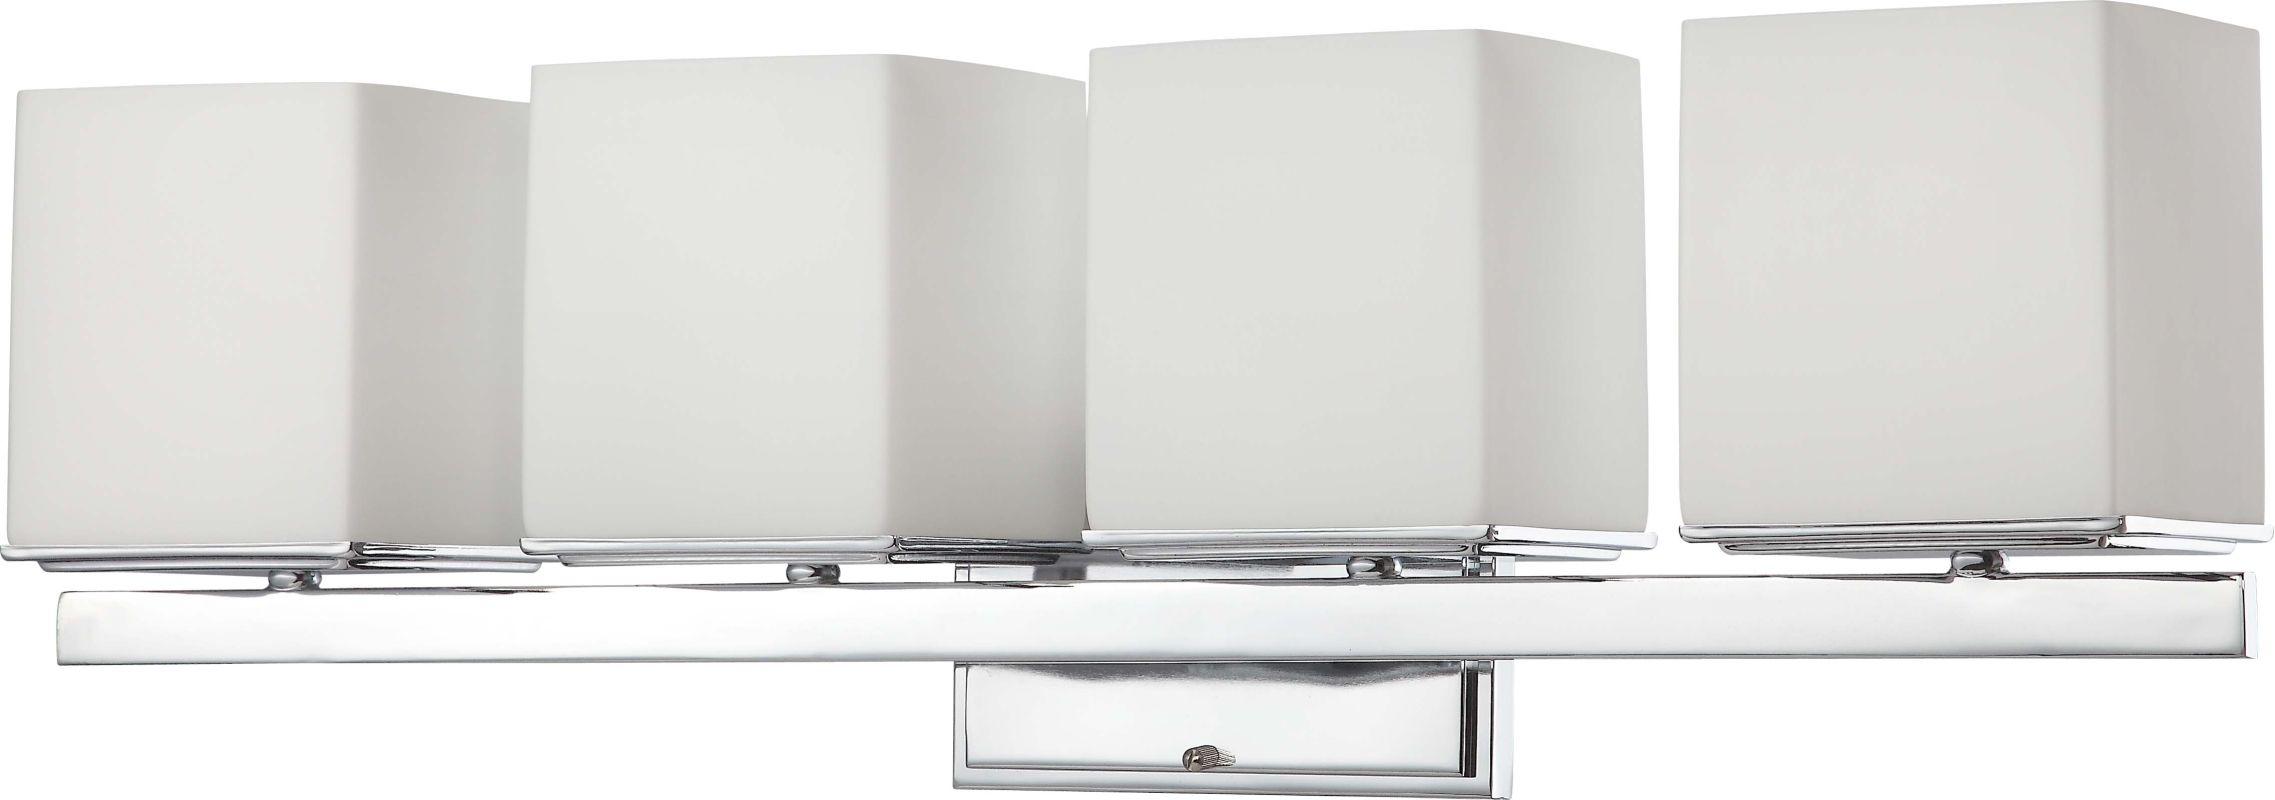 Nuvo Lighting 60/4084 Bento Four Light Bathroom Fixture with Satin Sale $219.99 ITEM: bci1948874 ID#:60/4084 UPC: 45923640841 :